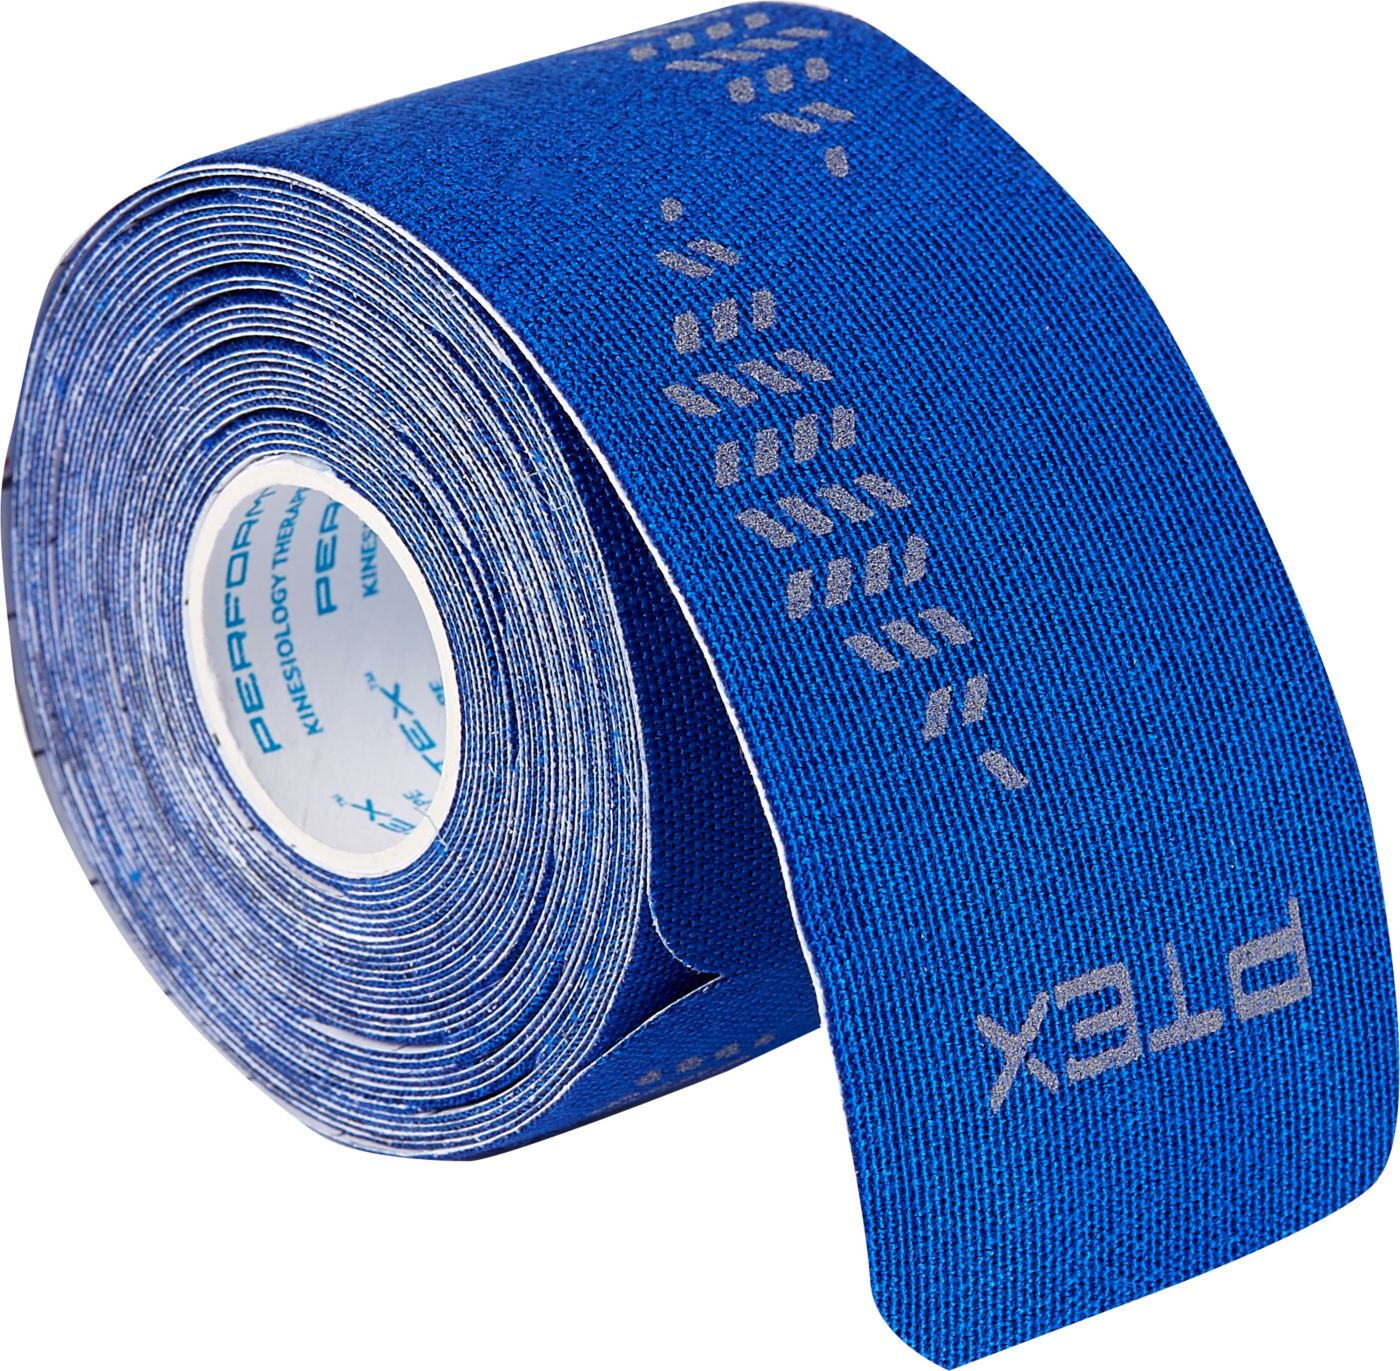 P-TEX PRO Kinesiology Tape